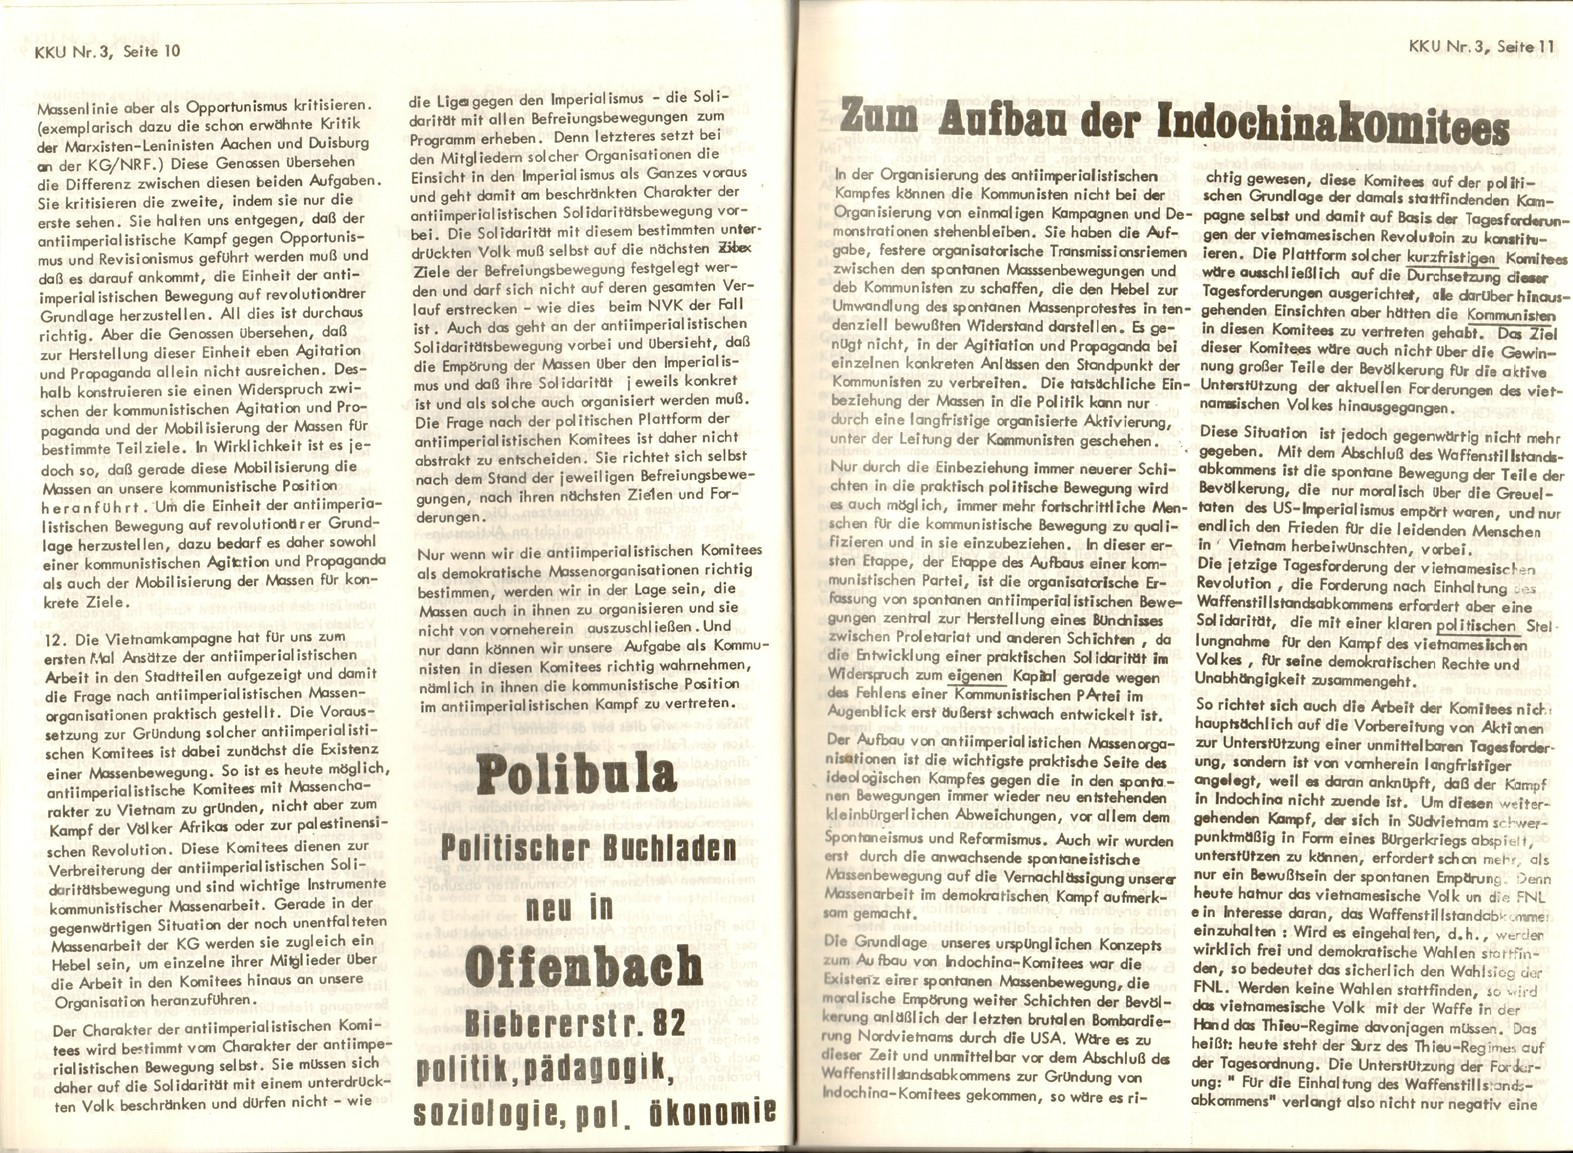 Frankfurt_Offenbach_KG_Kampf_Kritik_Umgestaltung_1973_03_07